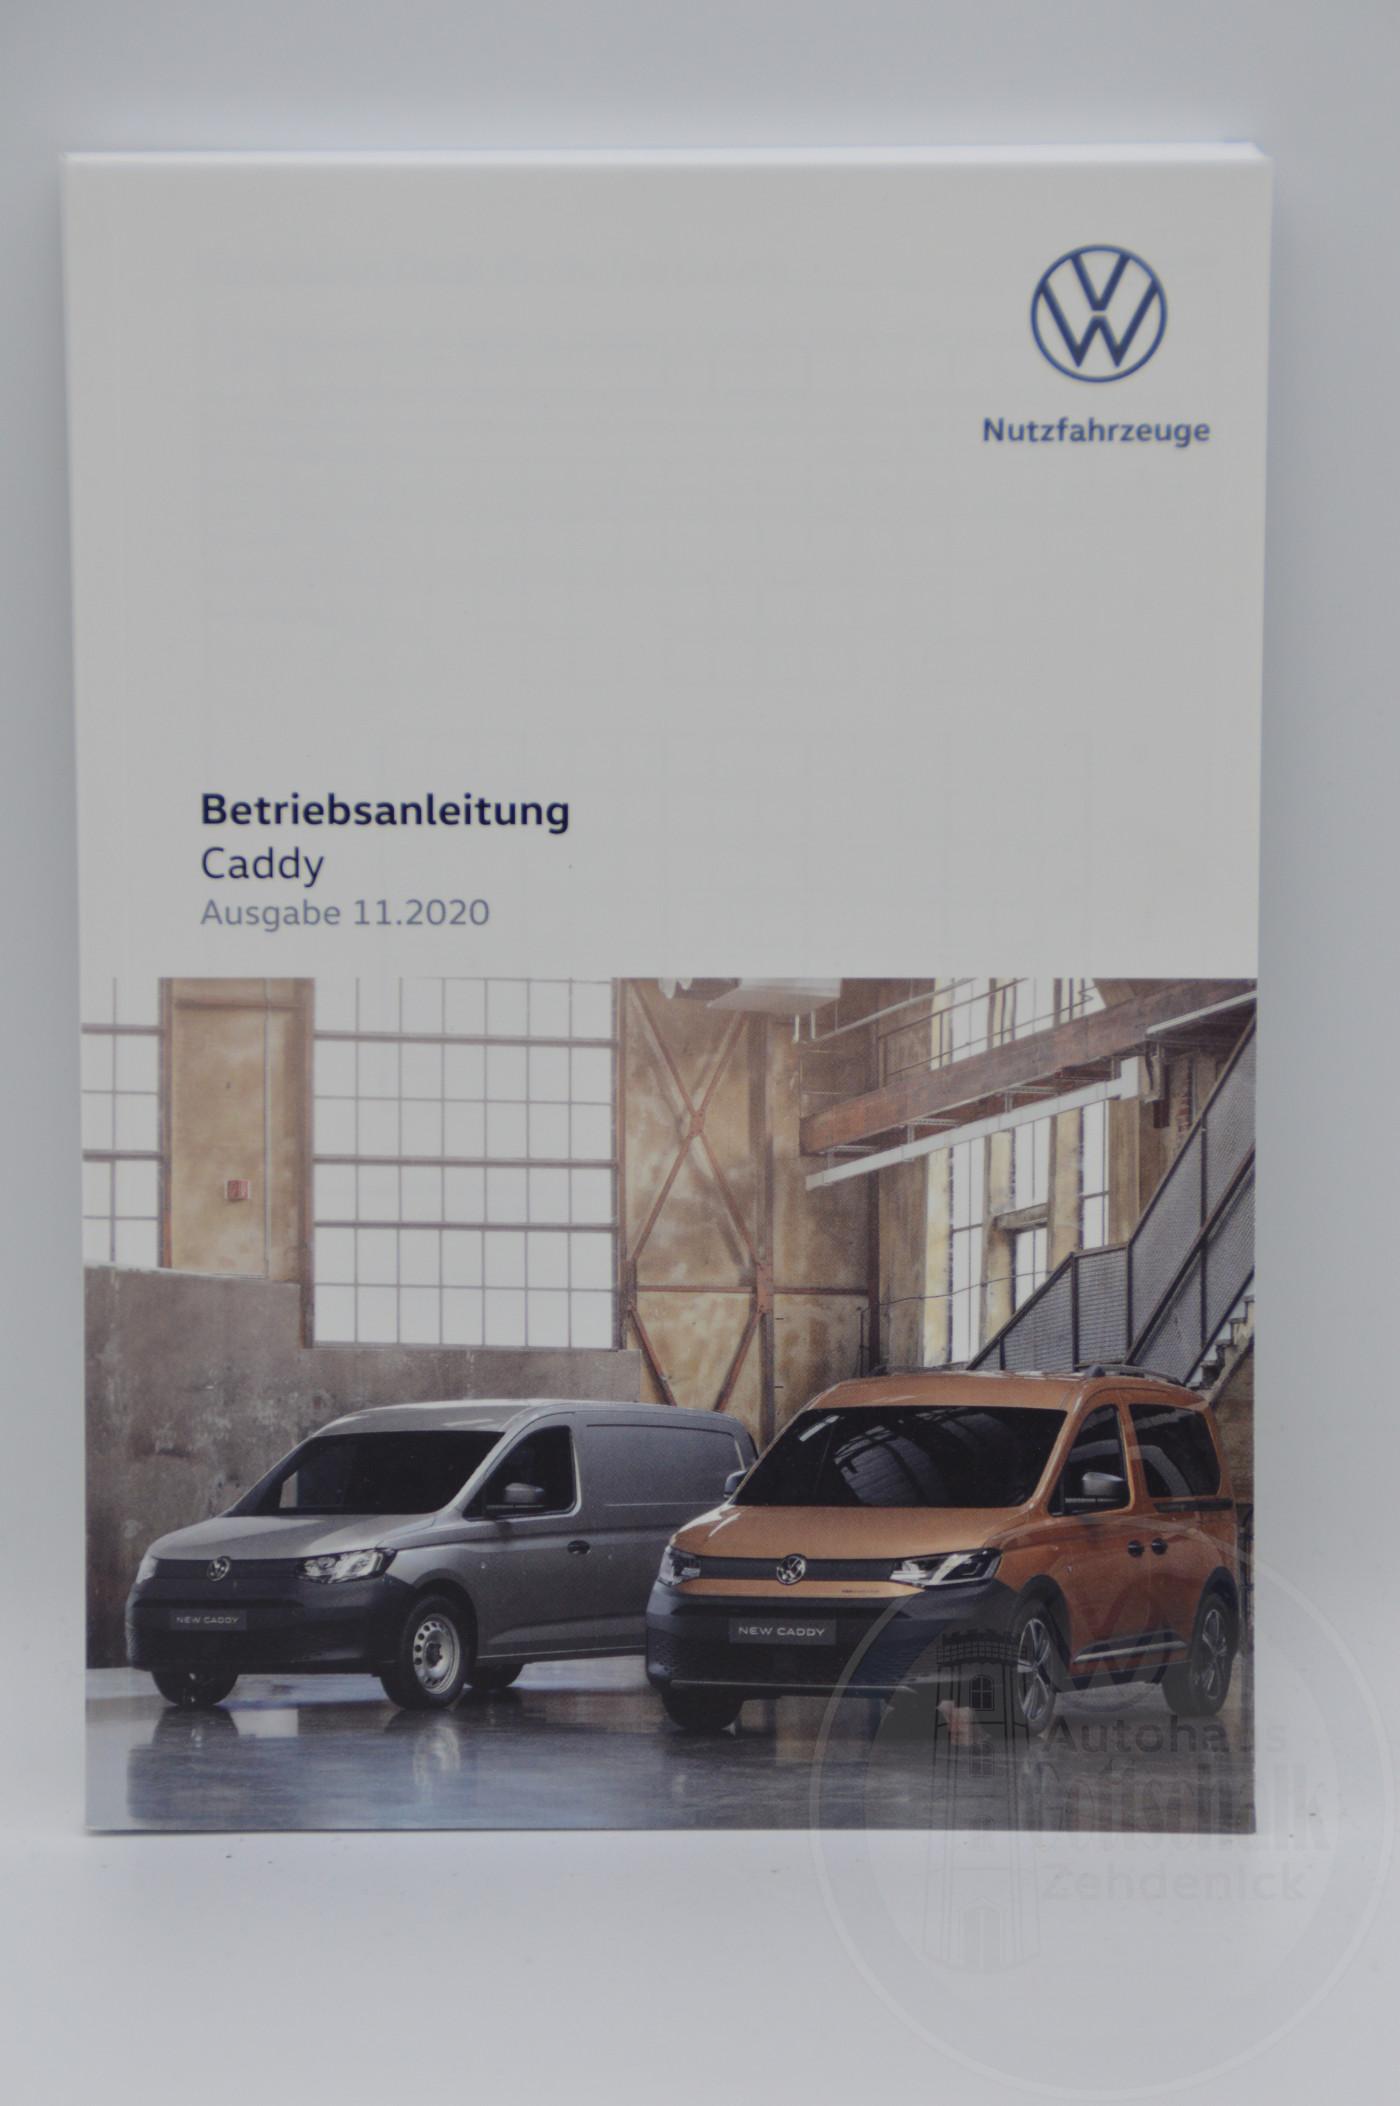 Original VW Caddy 5 SB Bedienungsanleitung Betriebsanleitung Handbuch Bordbuch 11/2020 2K7012705AB